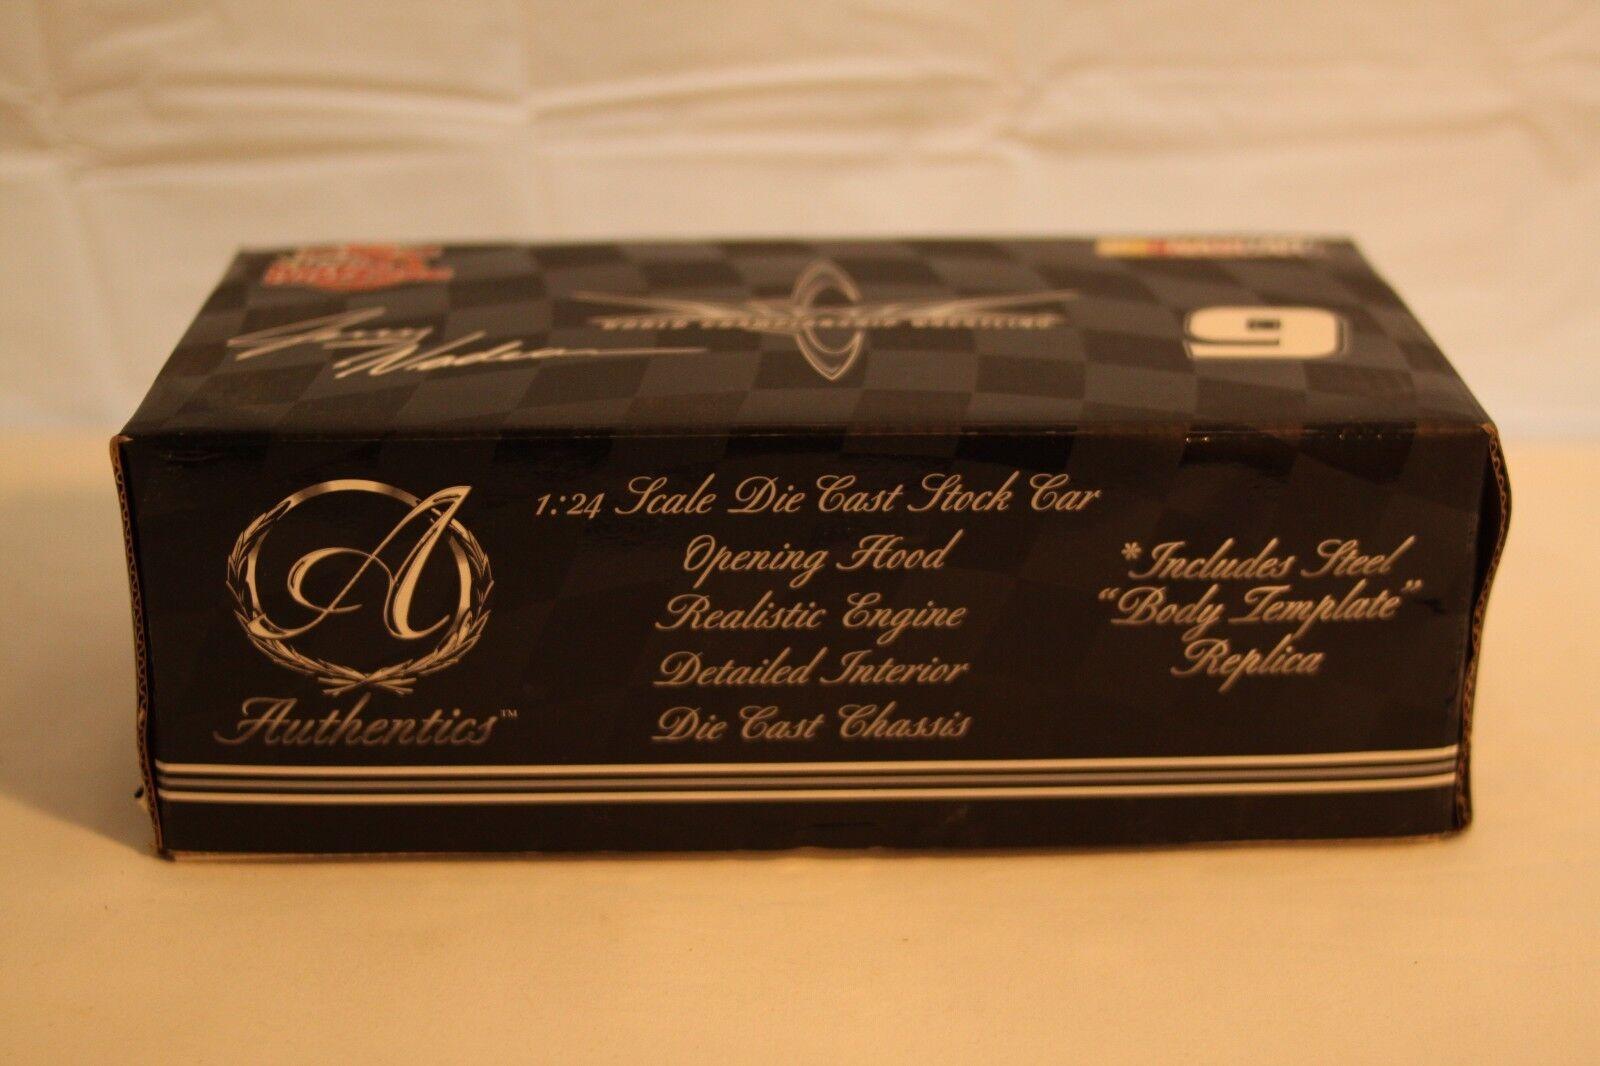 WCW NWO NASCAR Jerry Nadeau Racing Champions Authentics Diecast Car 1 24